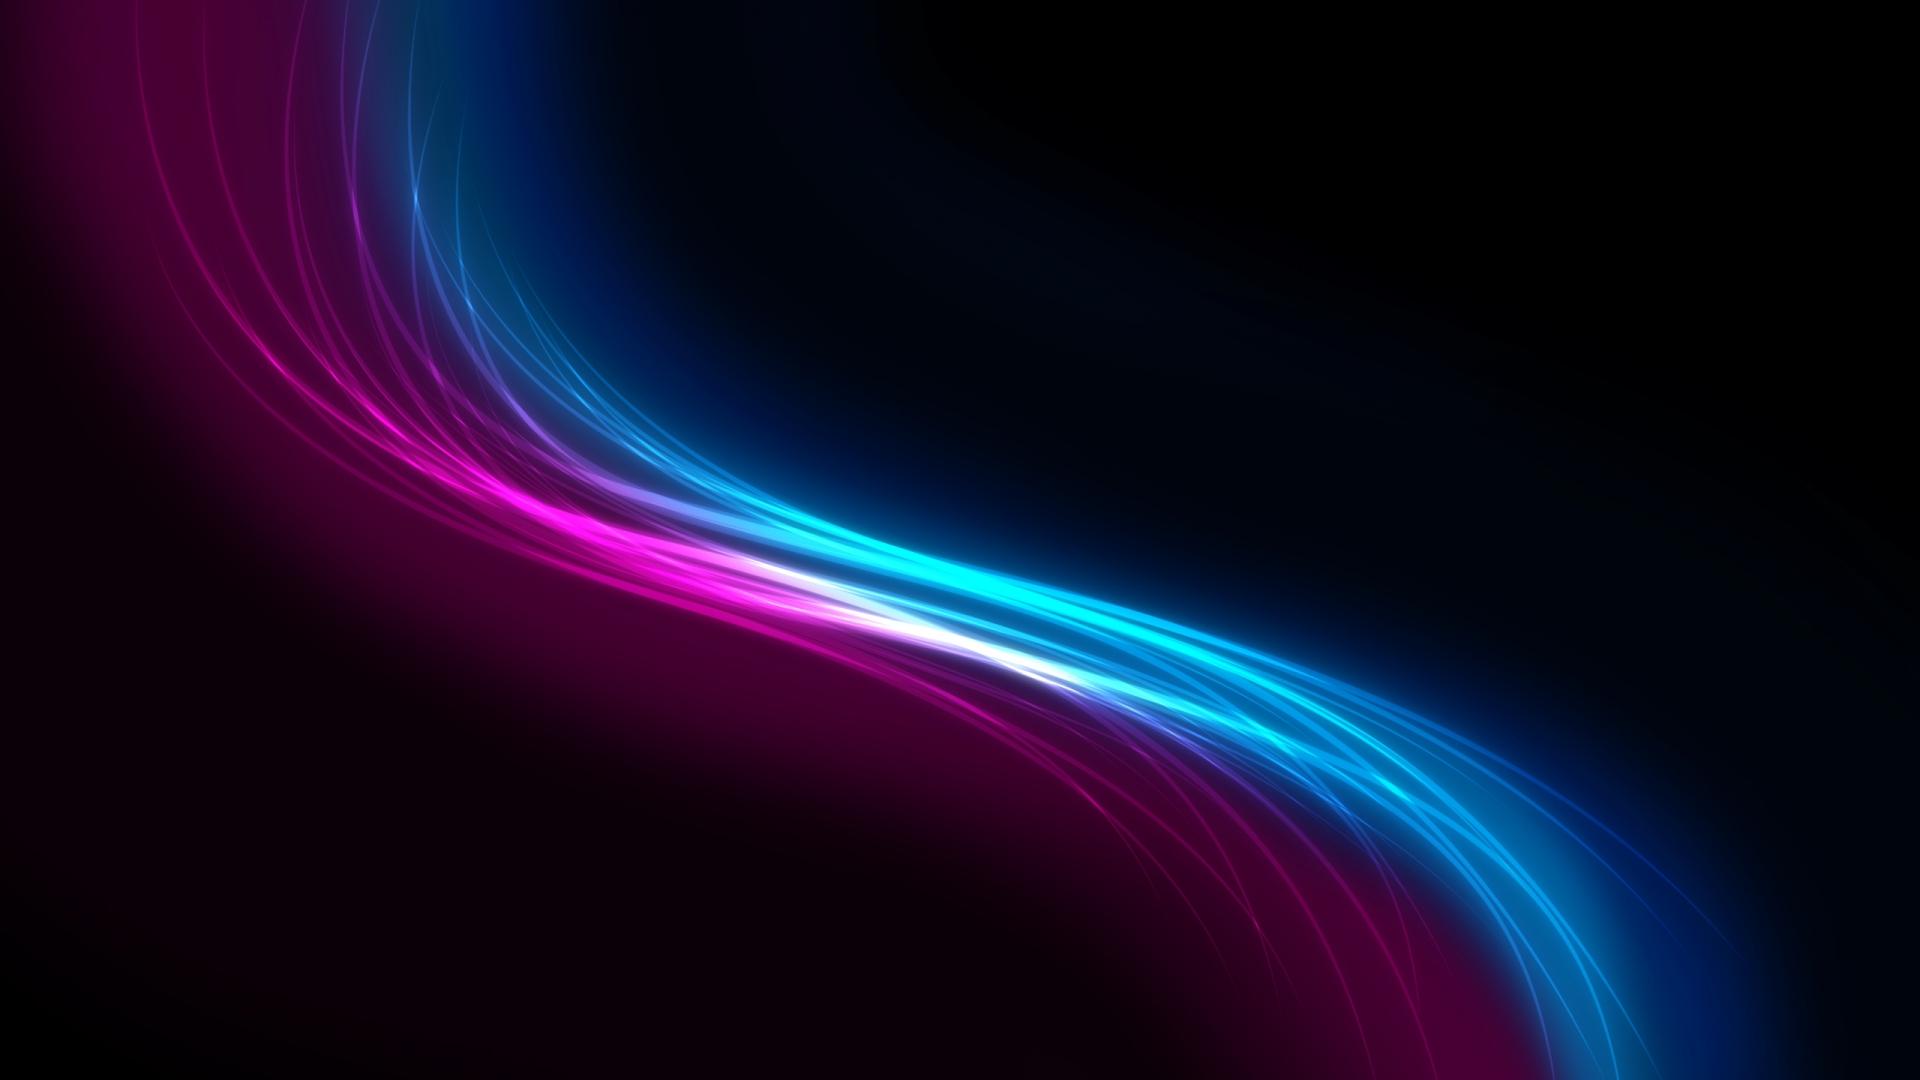 Black-Swirl-Wallpaper